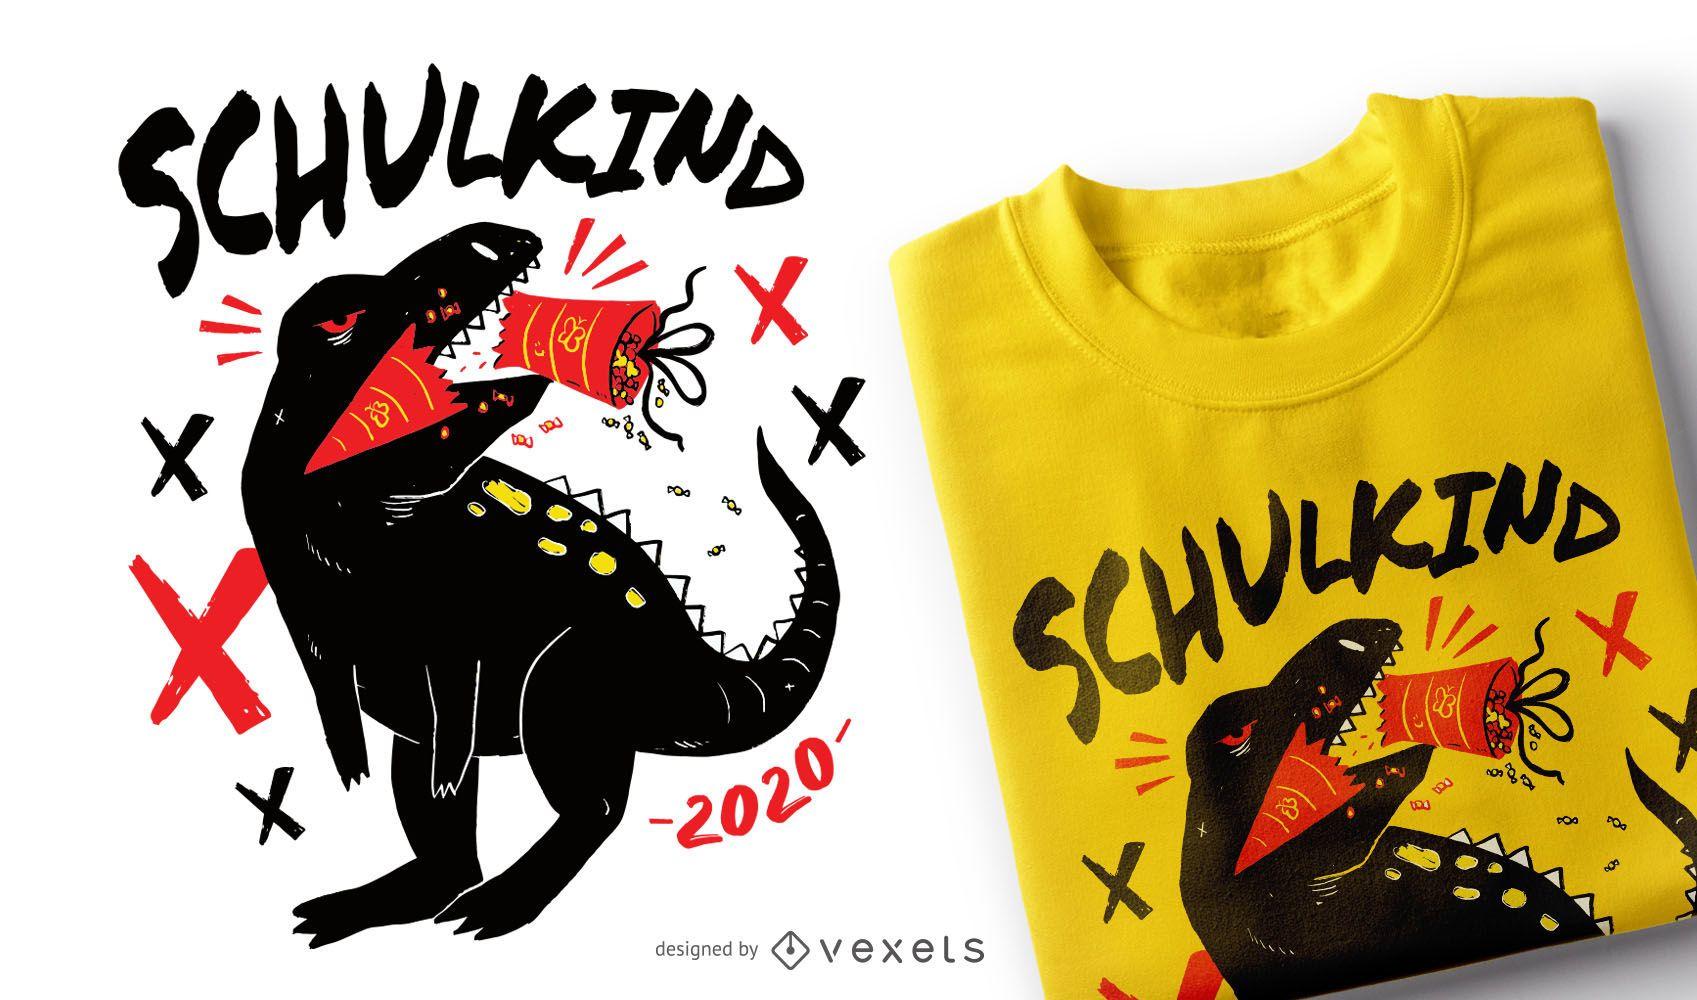 Diseño de camiseta alemana T-rex School